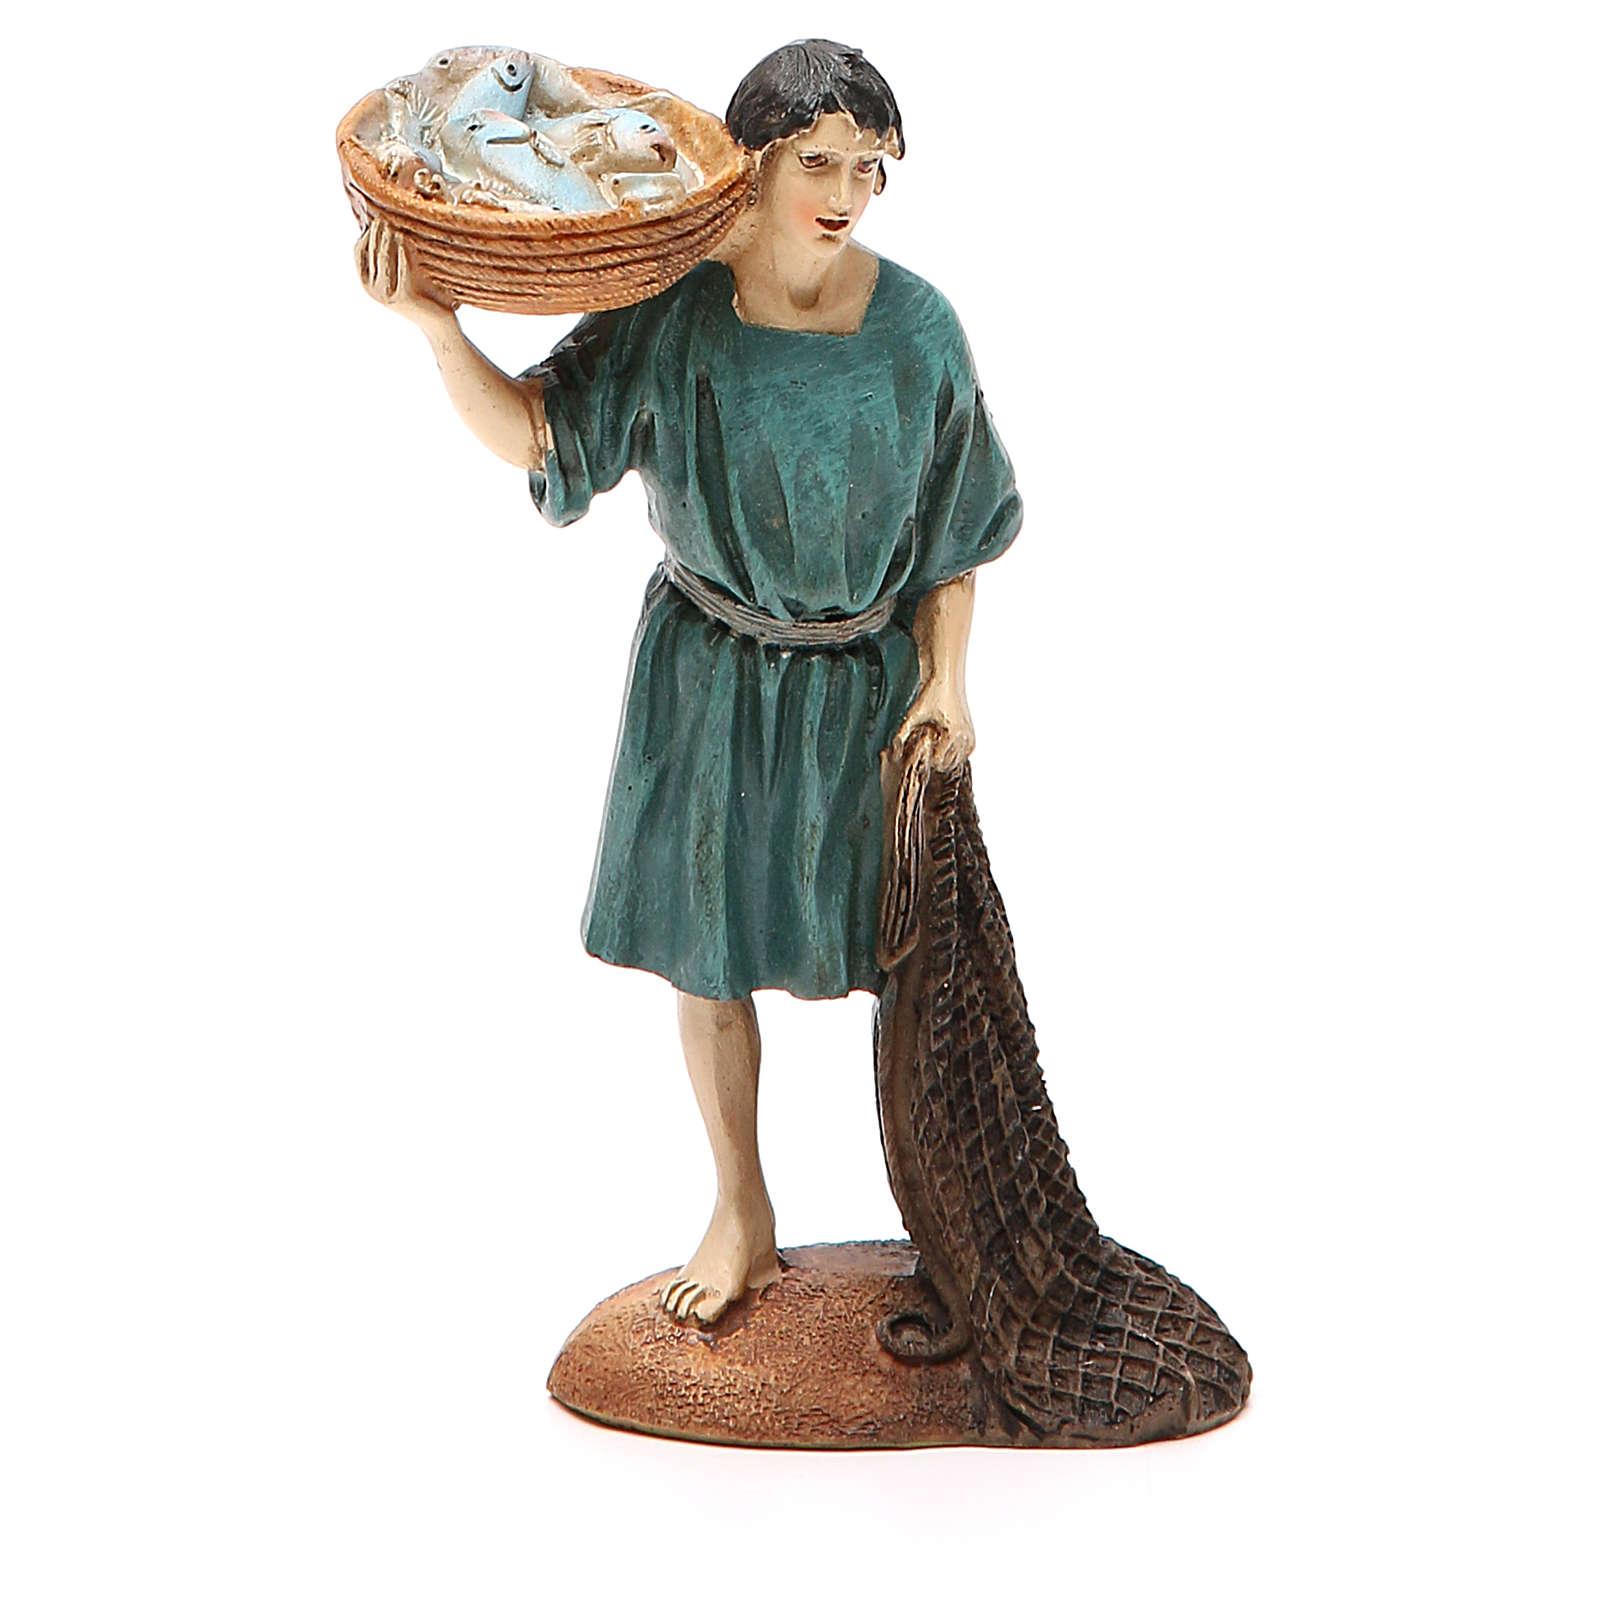 Pescador con red y cesto resina pintada cm 12 Línea Martino Landi 3